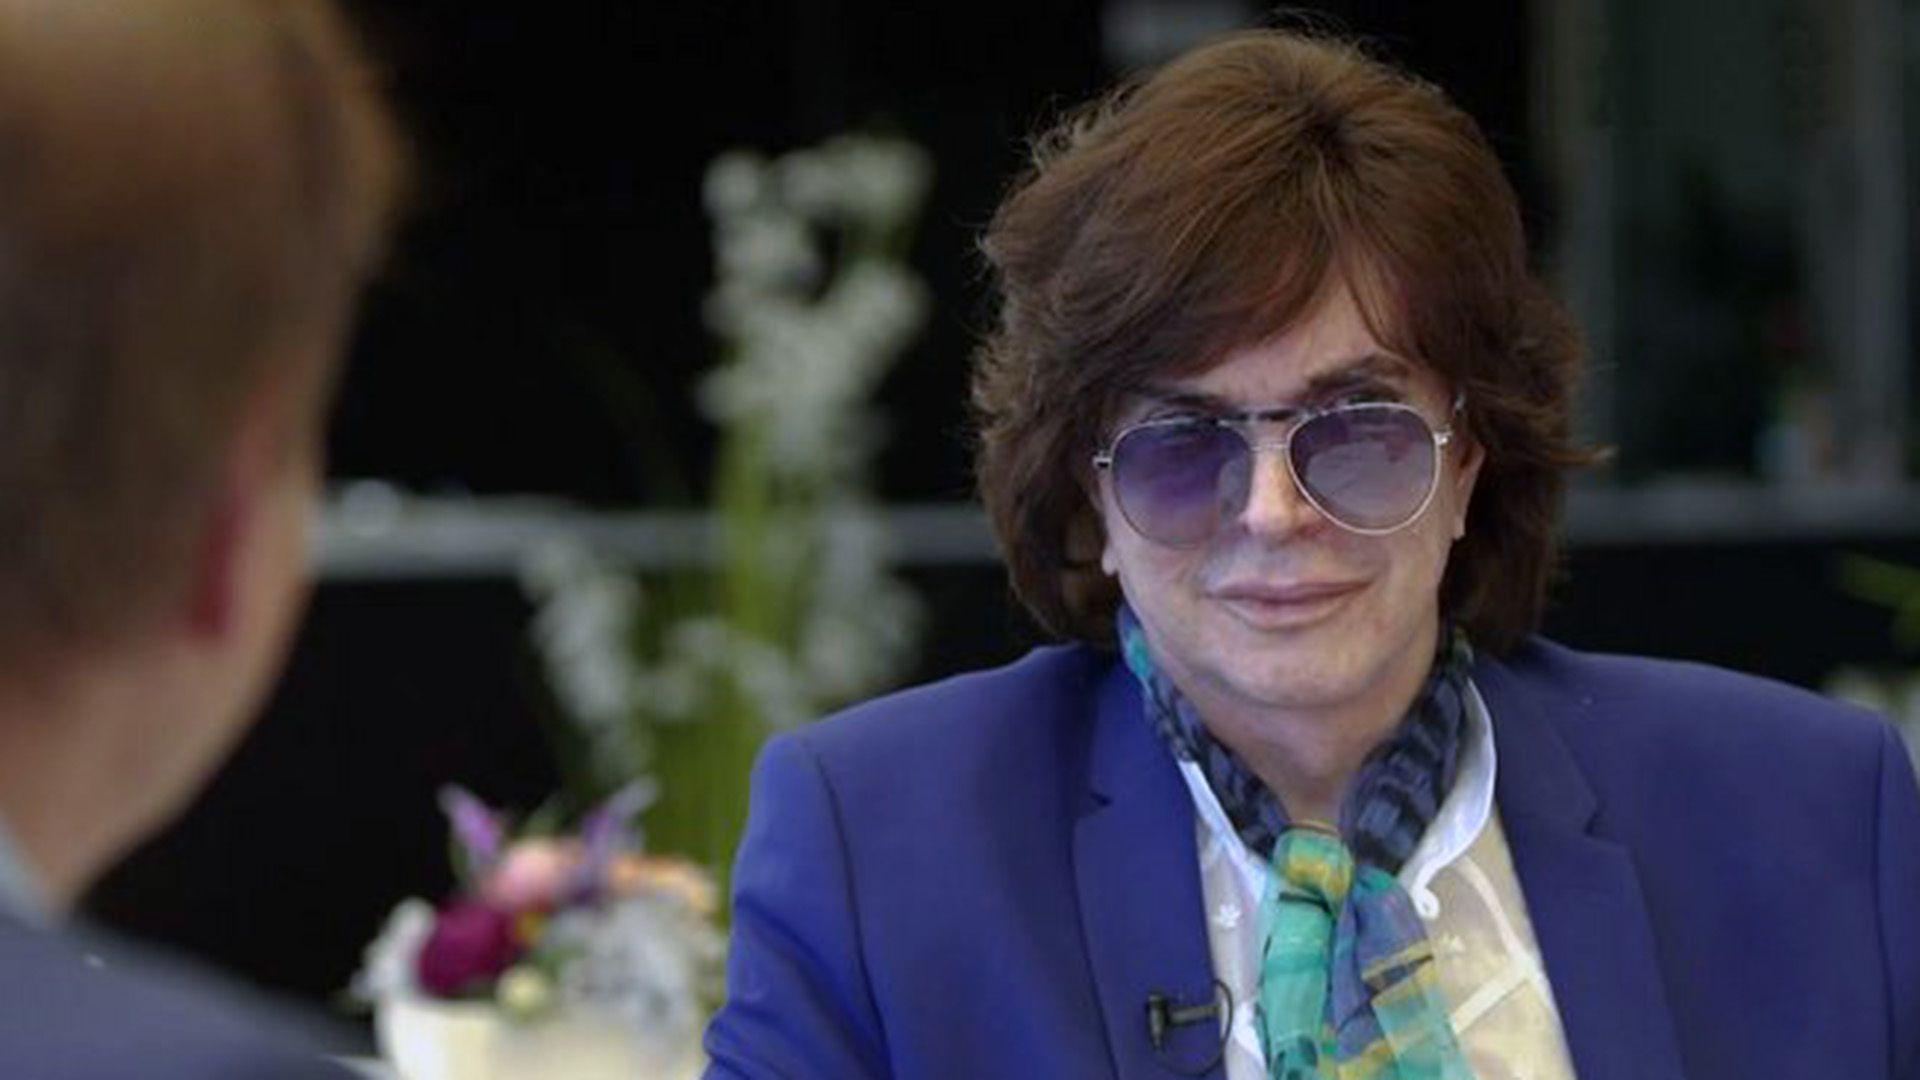 El cantante español falleció en la madrugada del domingo 8 de septiembre en Madrid (Twitter: @canalsur)